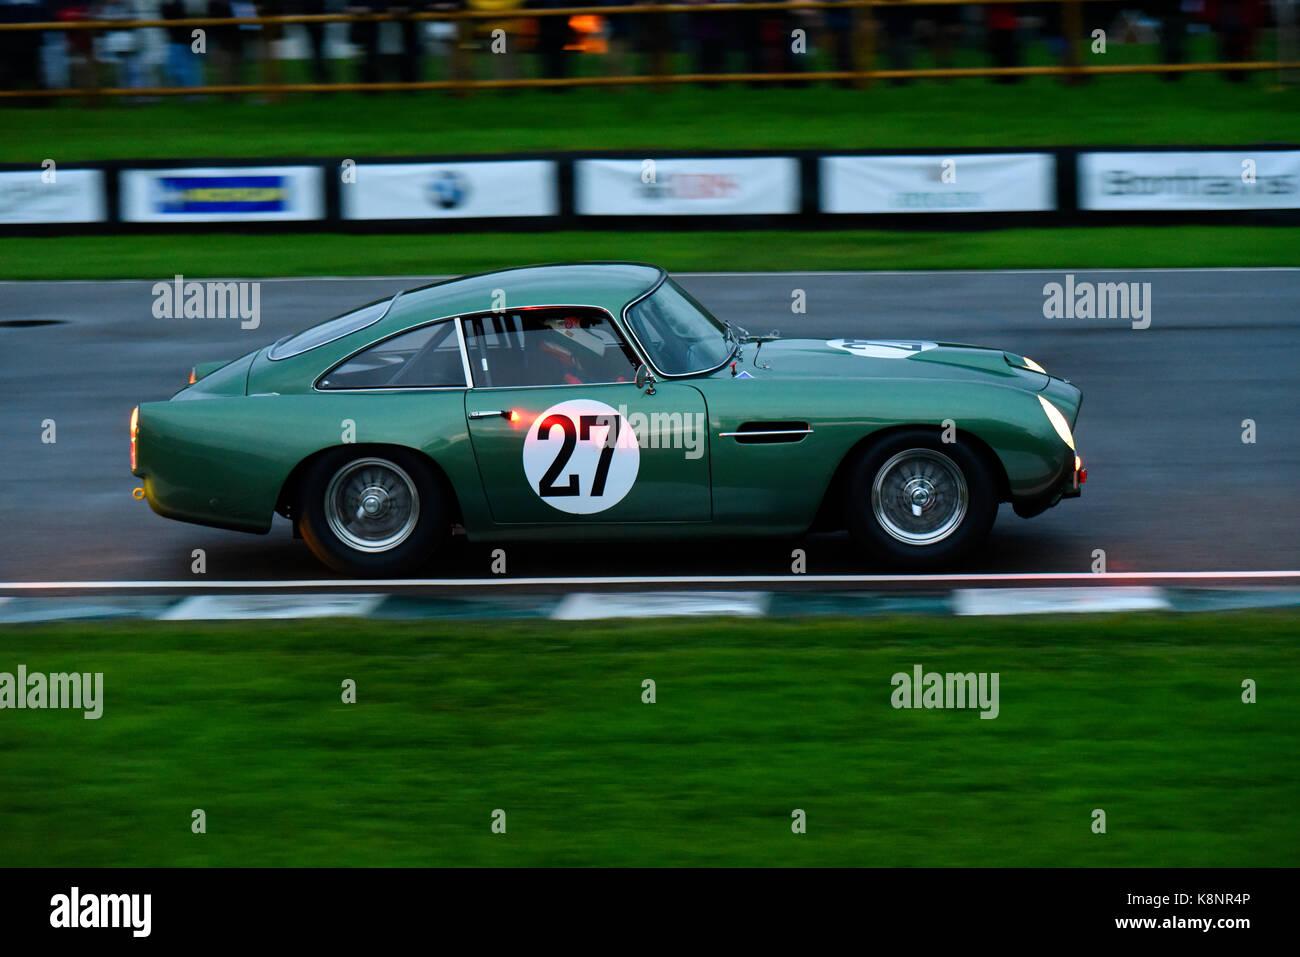 aston-martin-db4-gt-owned-by-urs-muller-racing-in-the-kinrara-trophy-K8NR4P.jpg